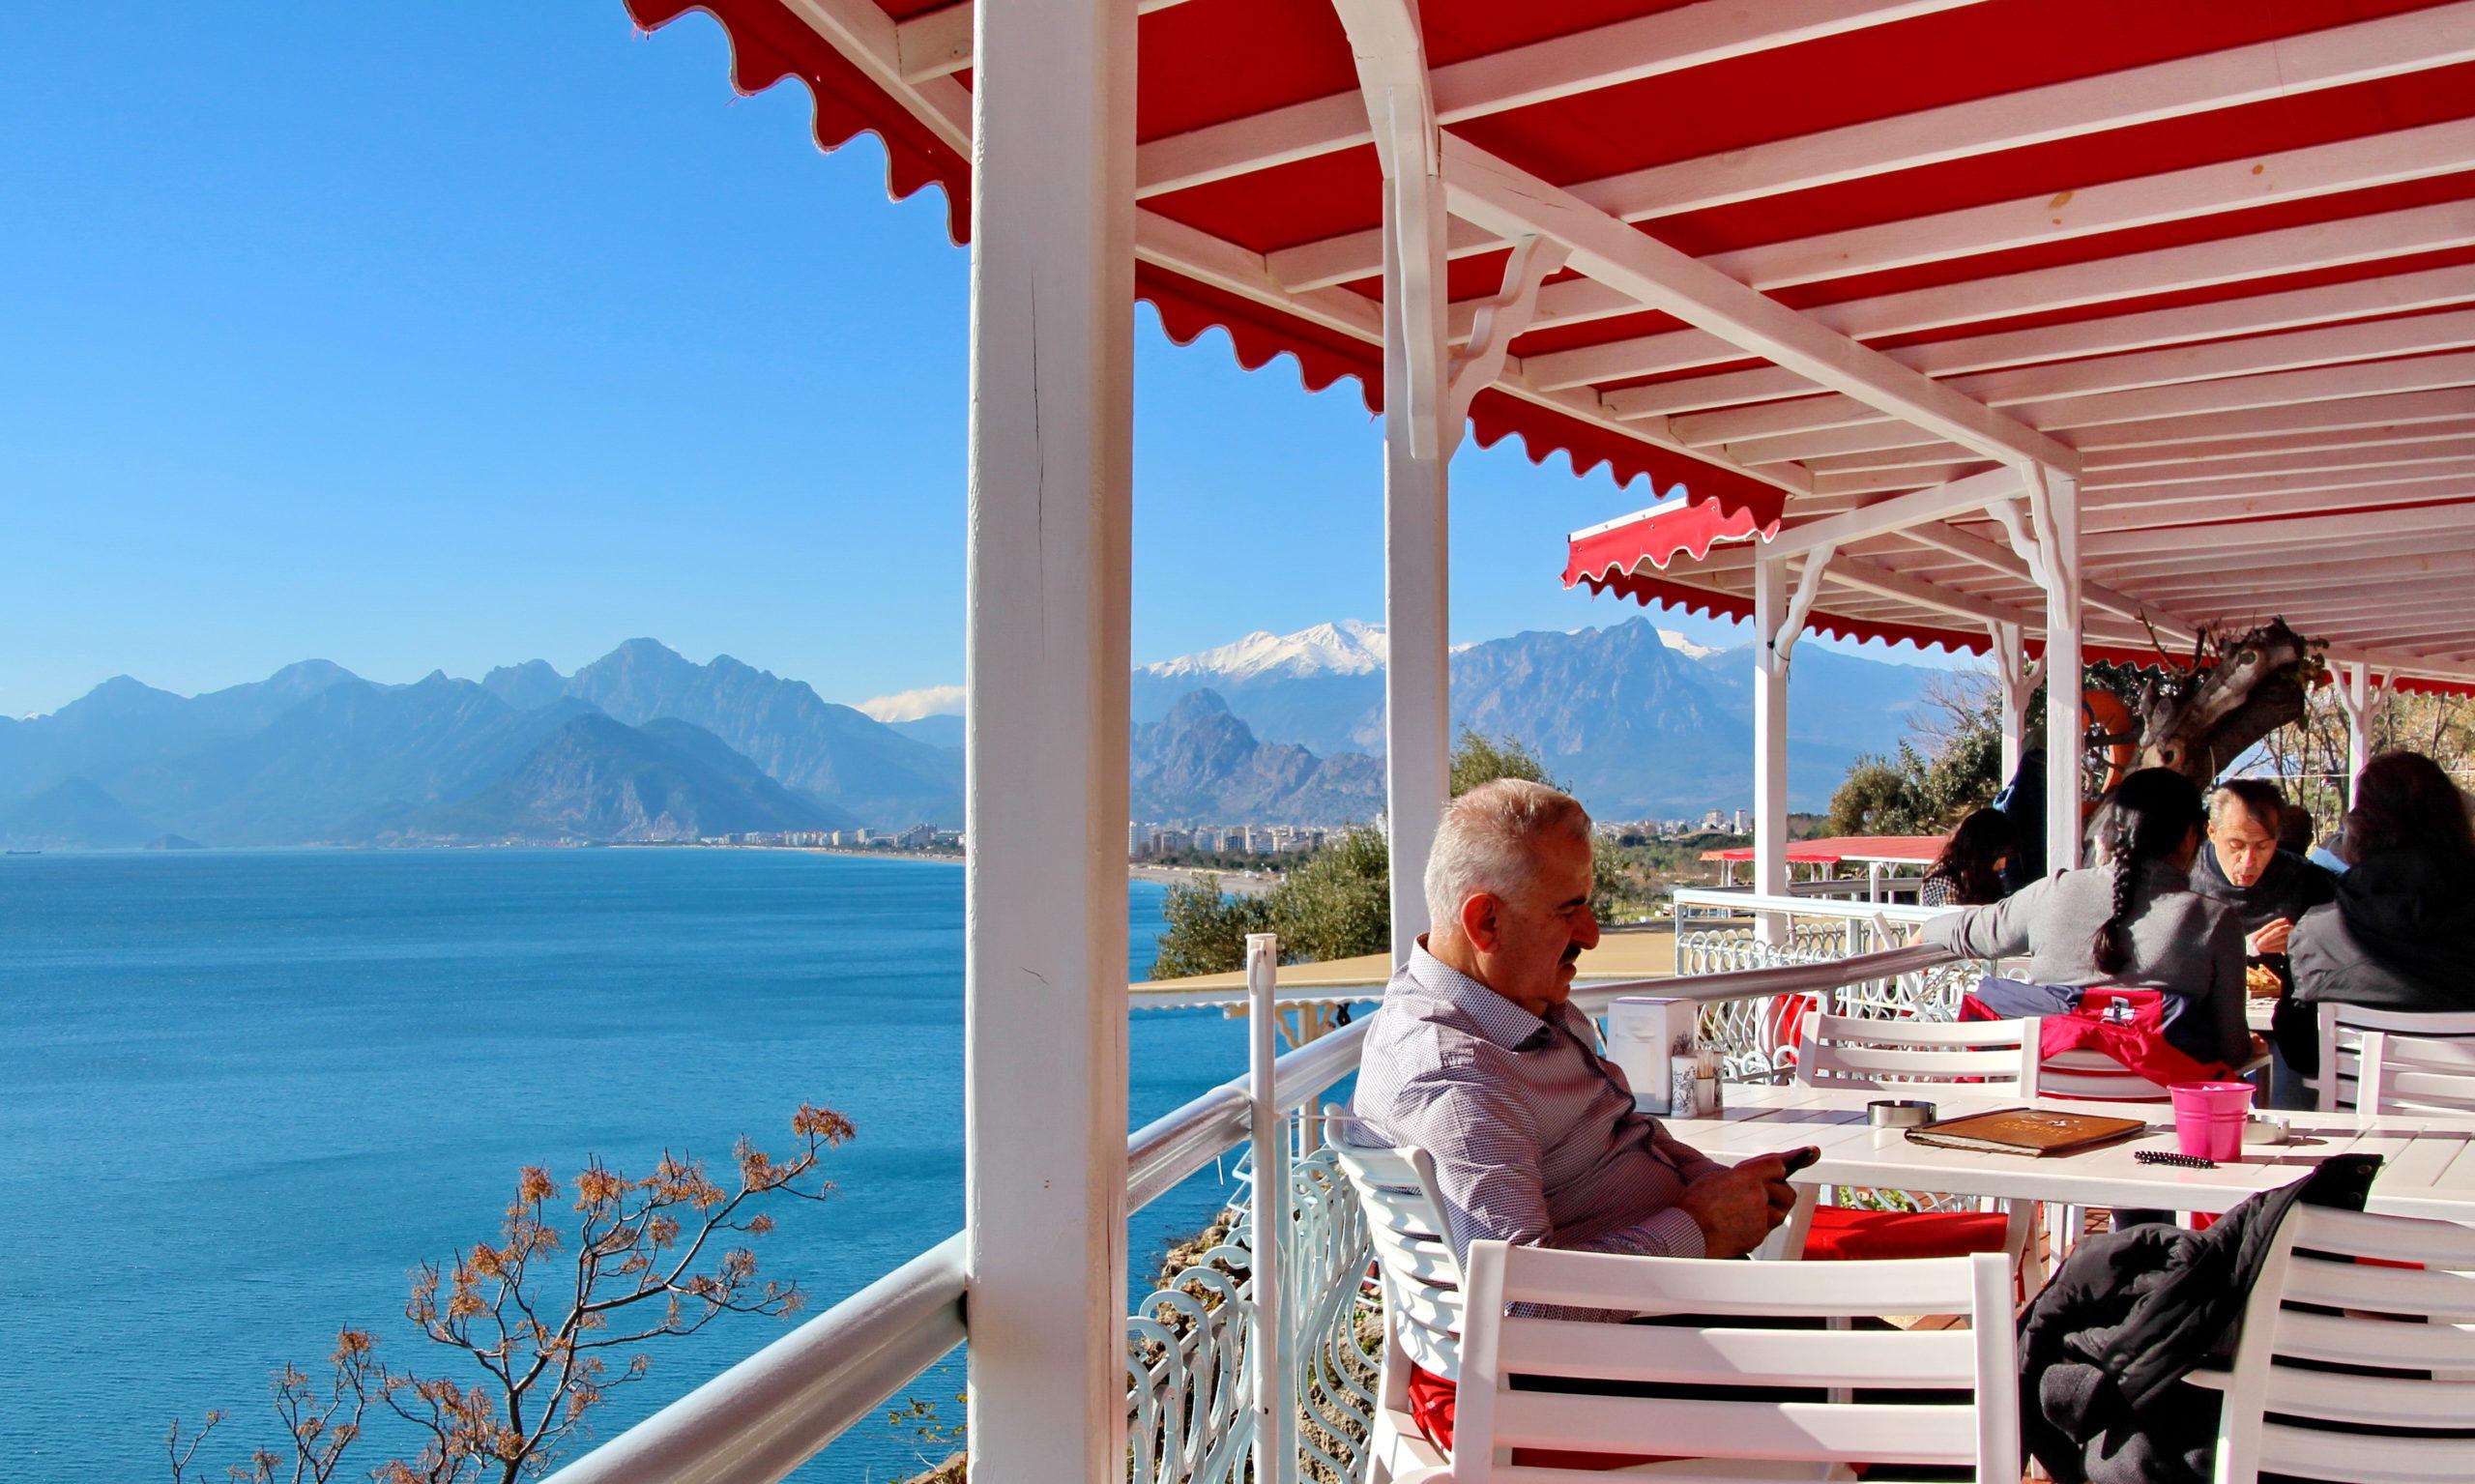 Antalya-Guide-10-scaled.jpg